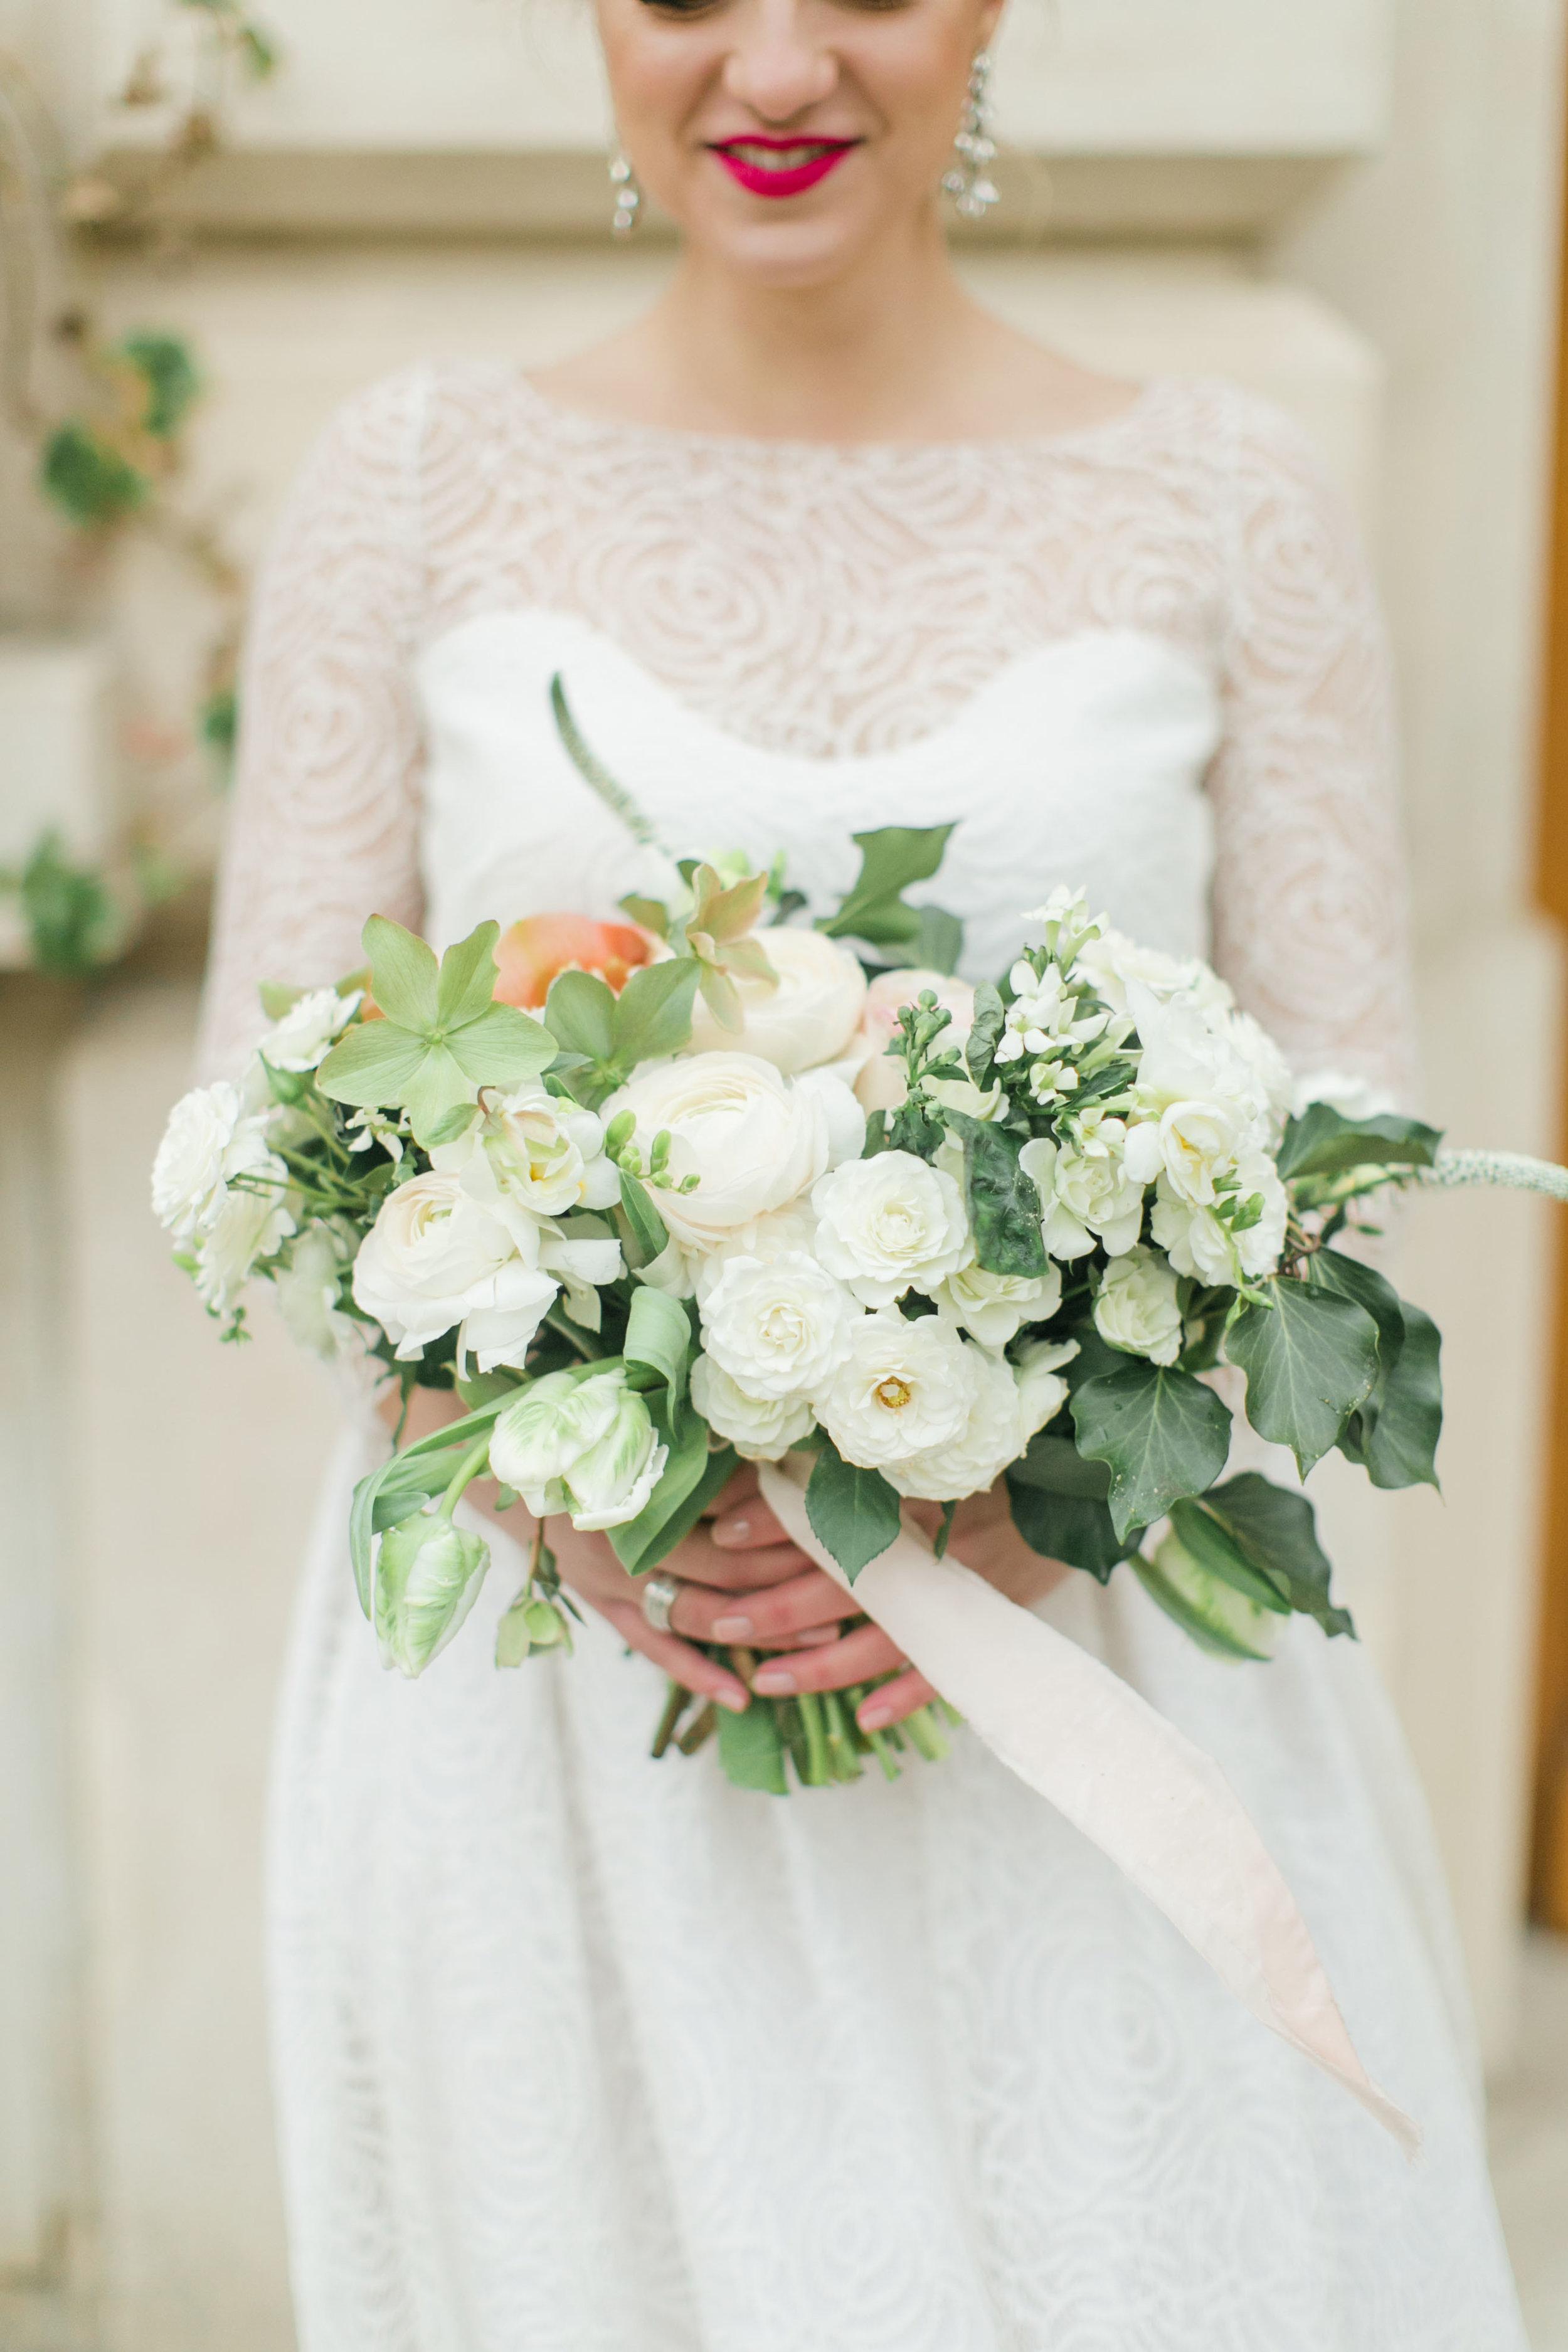 toronto-wedding-photographer-richelle-hunter-photography-new-york-paris-france-inspiration-102.jpg